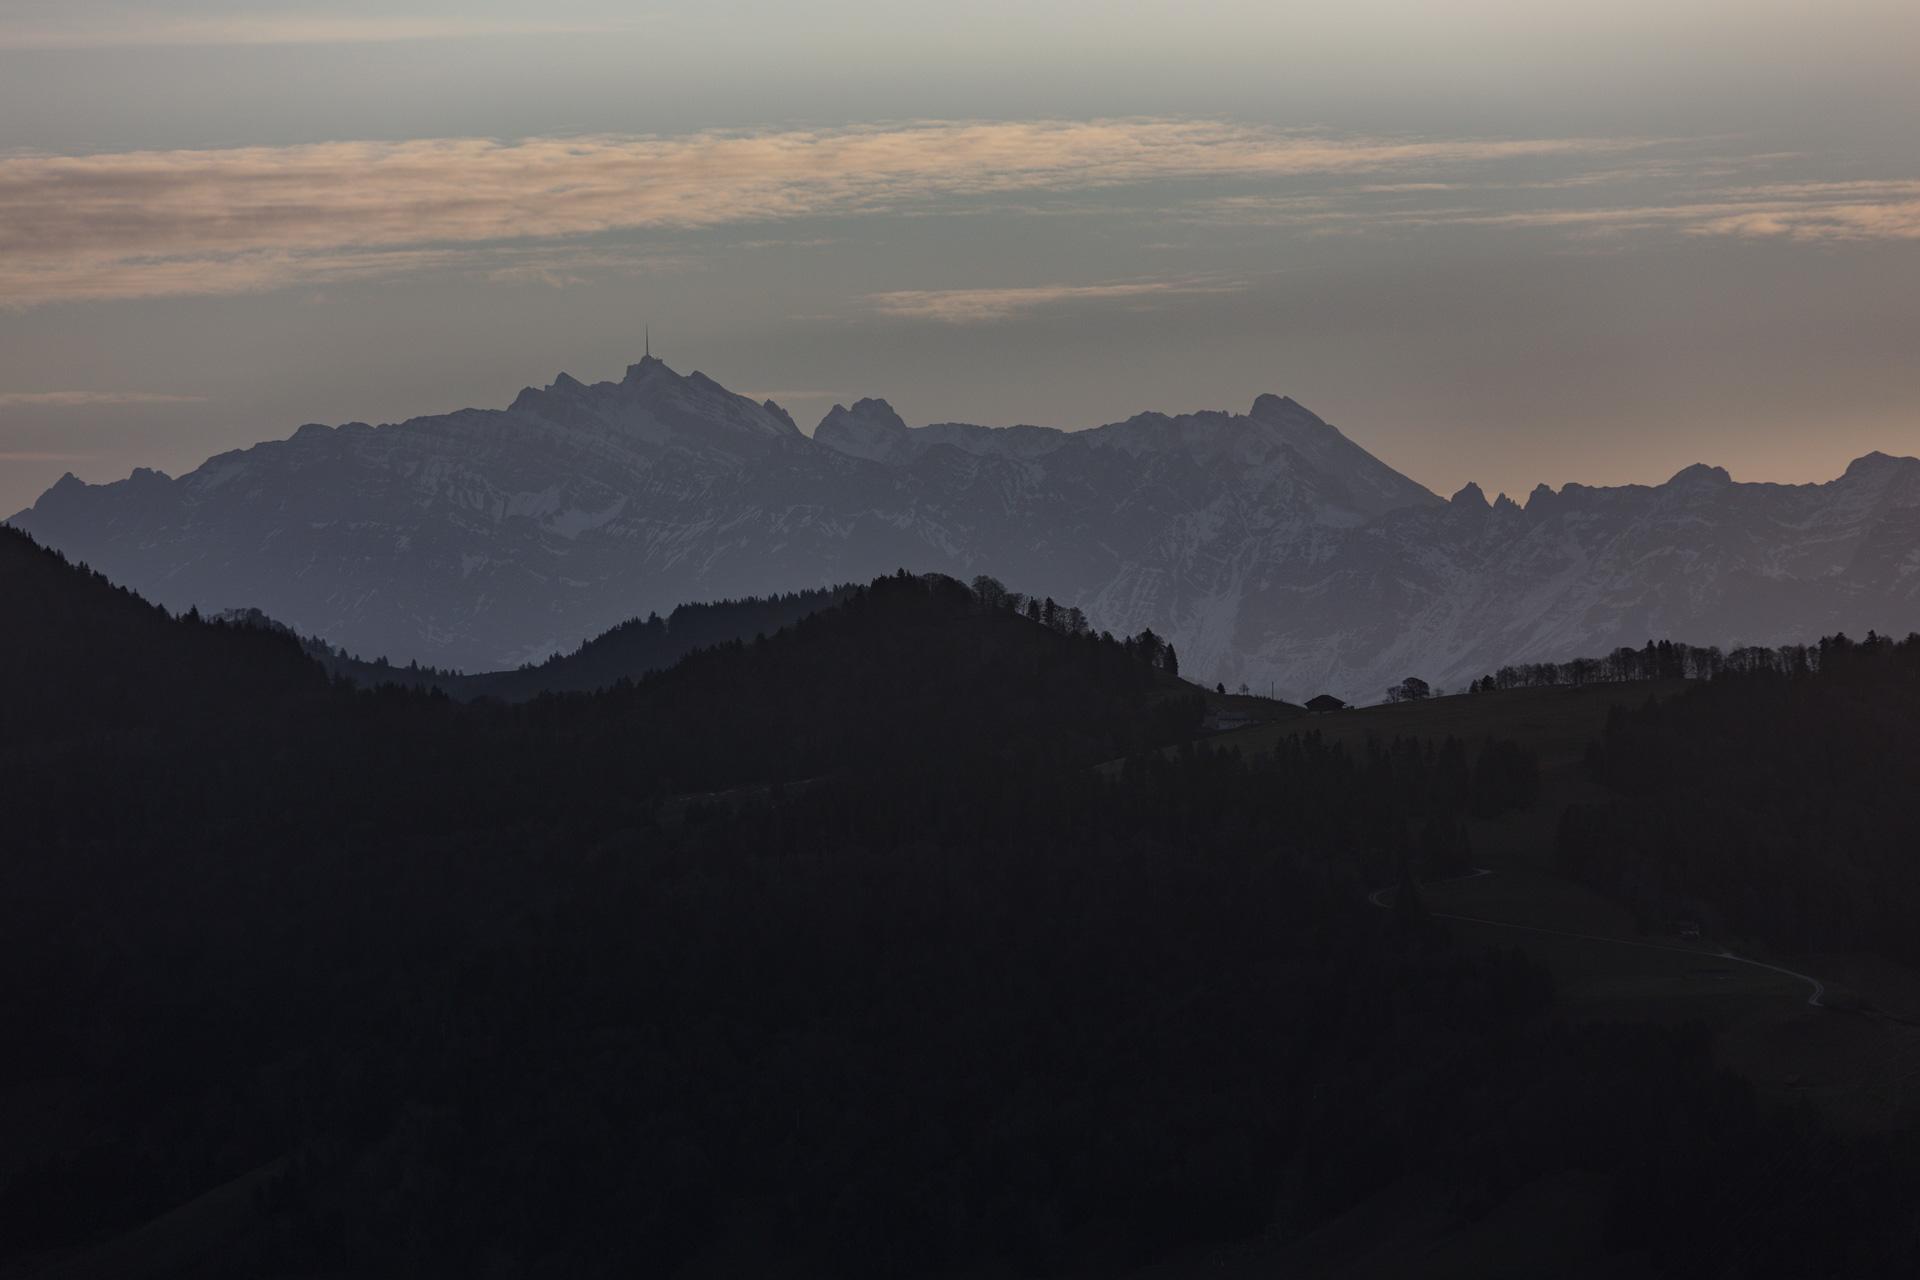 Sonnenaufgang-Bachtelturm_20151219_6010-1